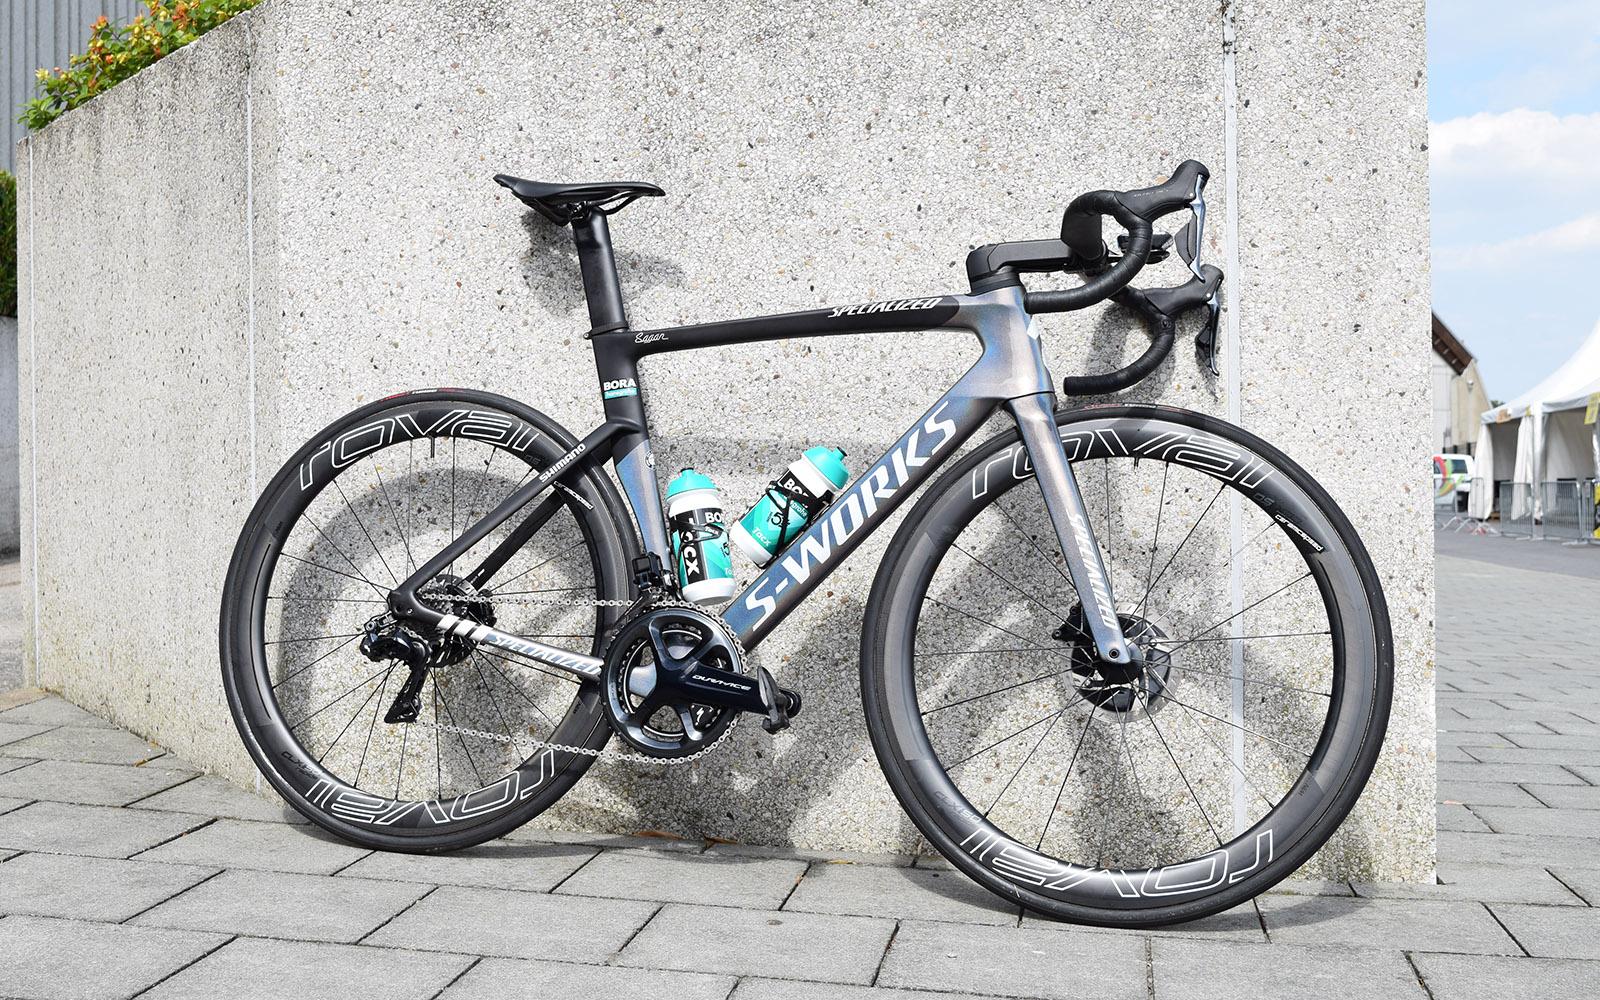 Tour de France bikes: Peter Sagan's S-Works Venge | Cyclingnews